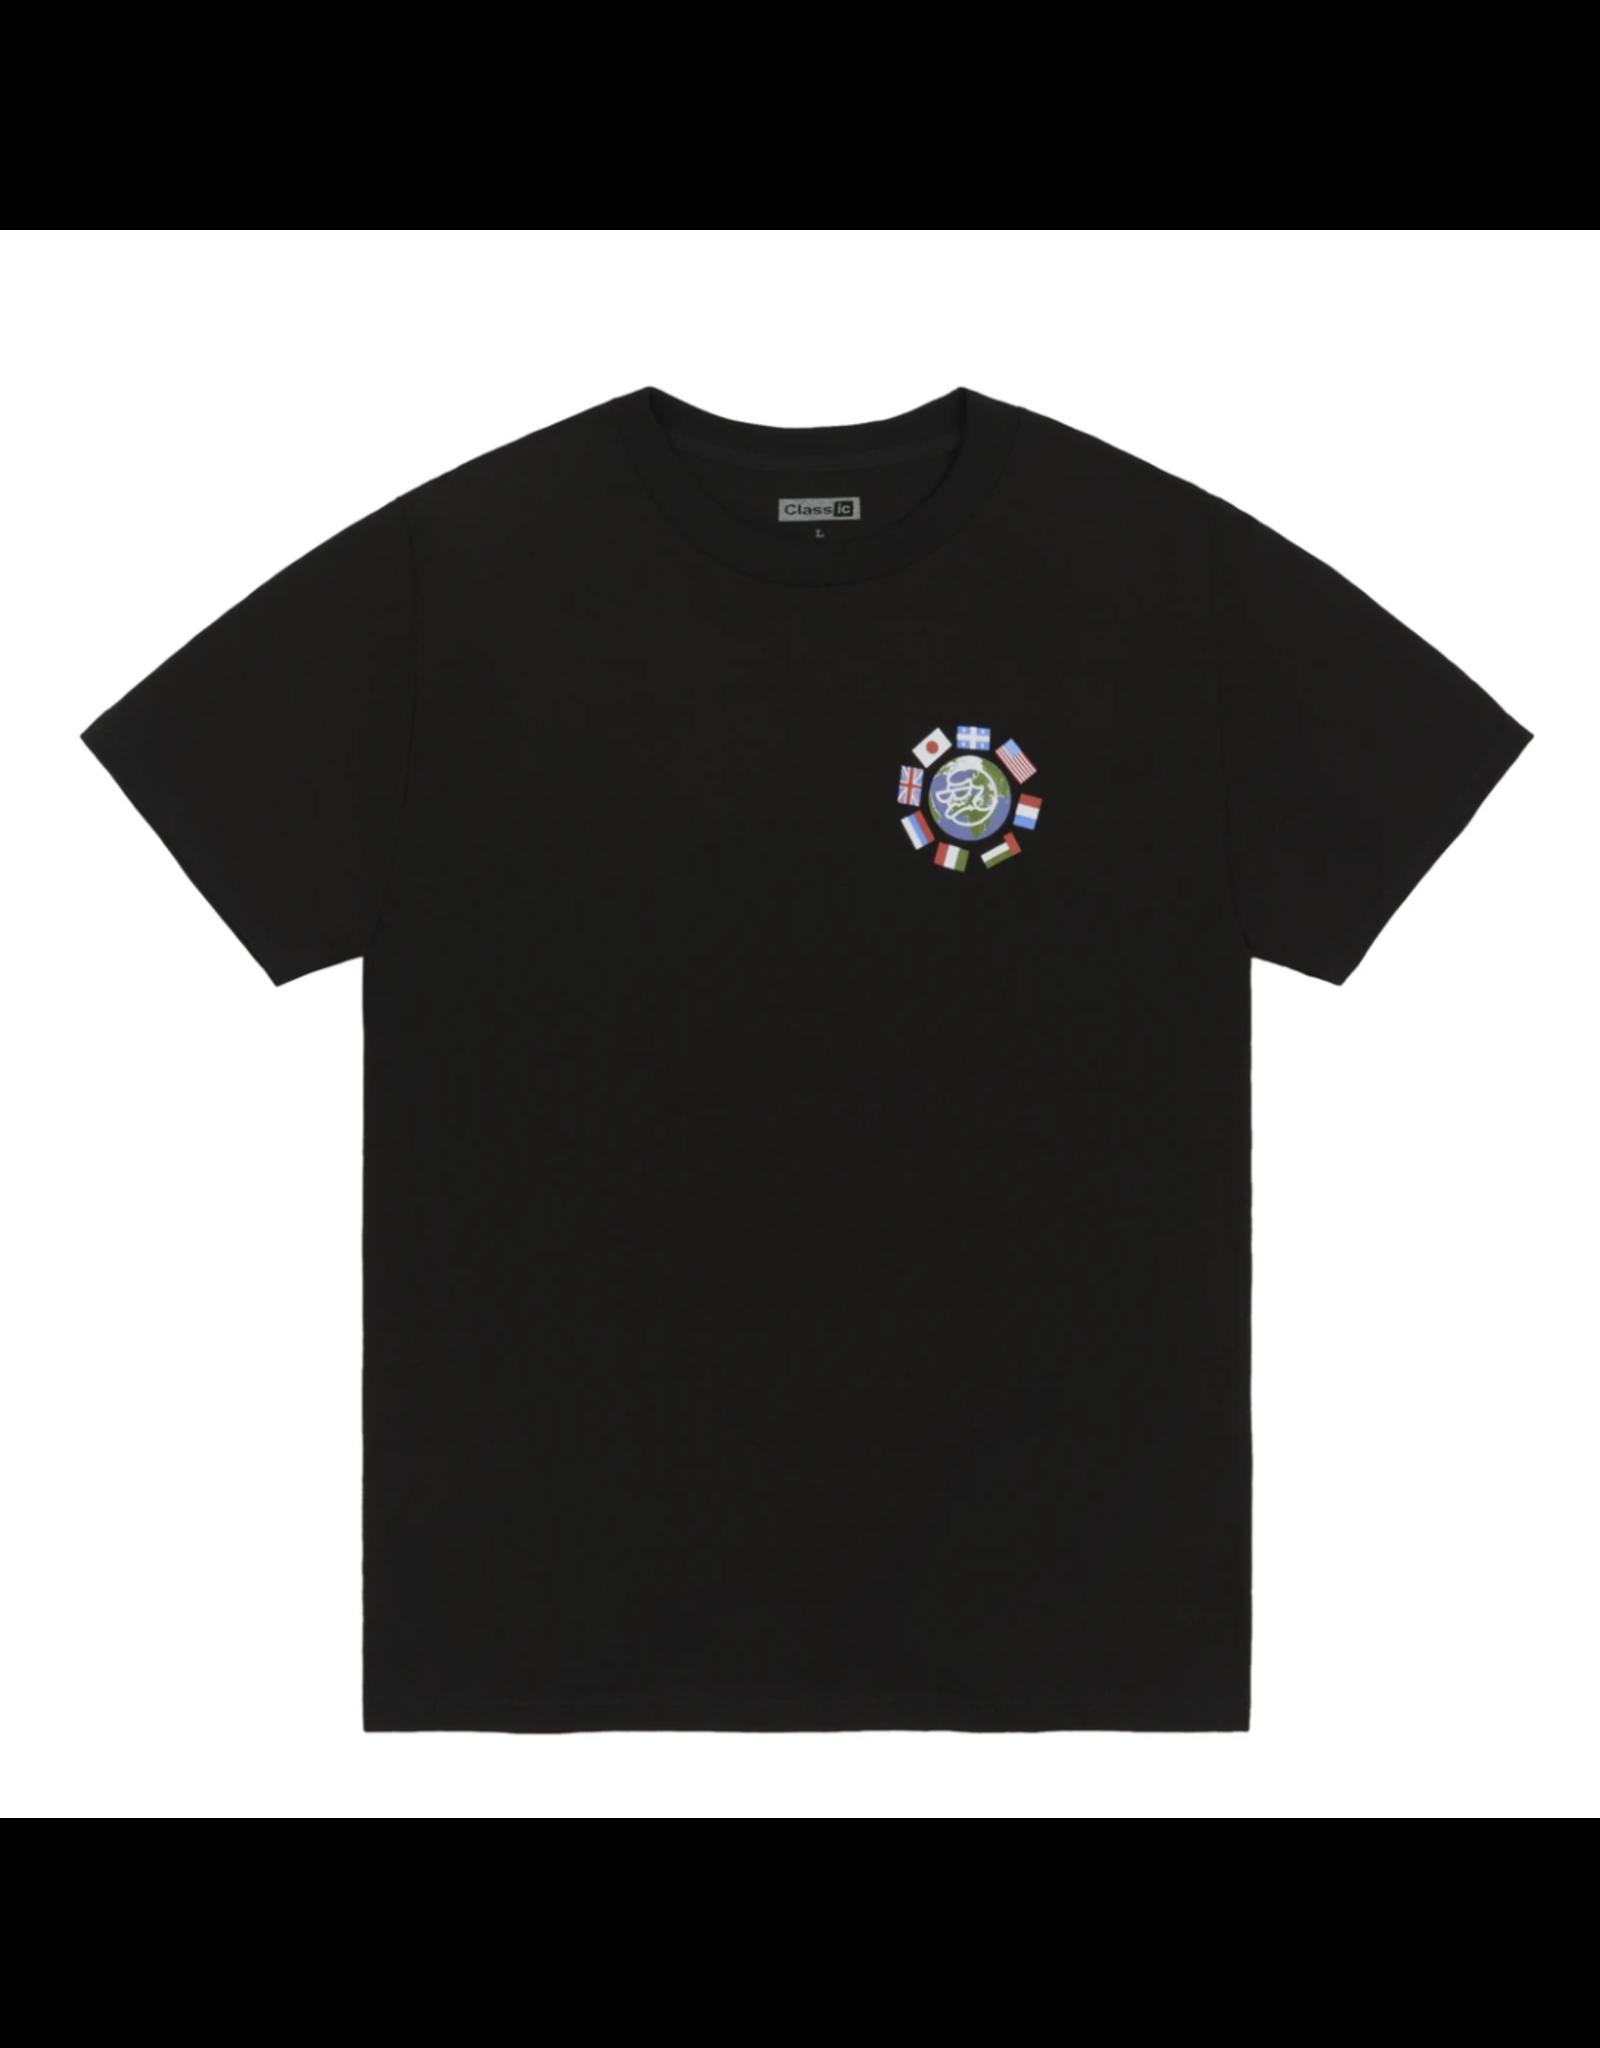 Classic 5-Oclock T-Shirt - Black